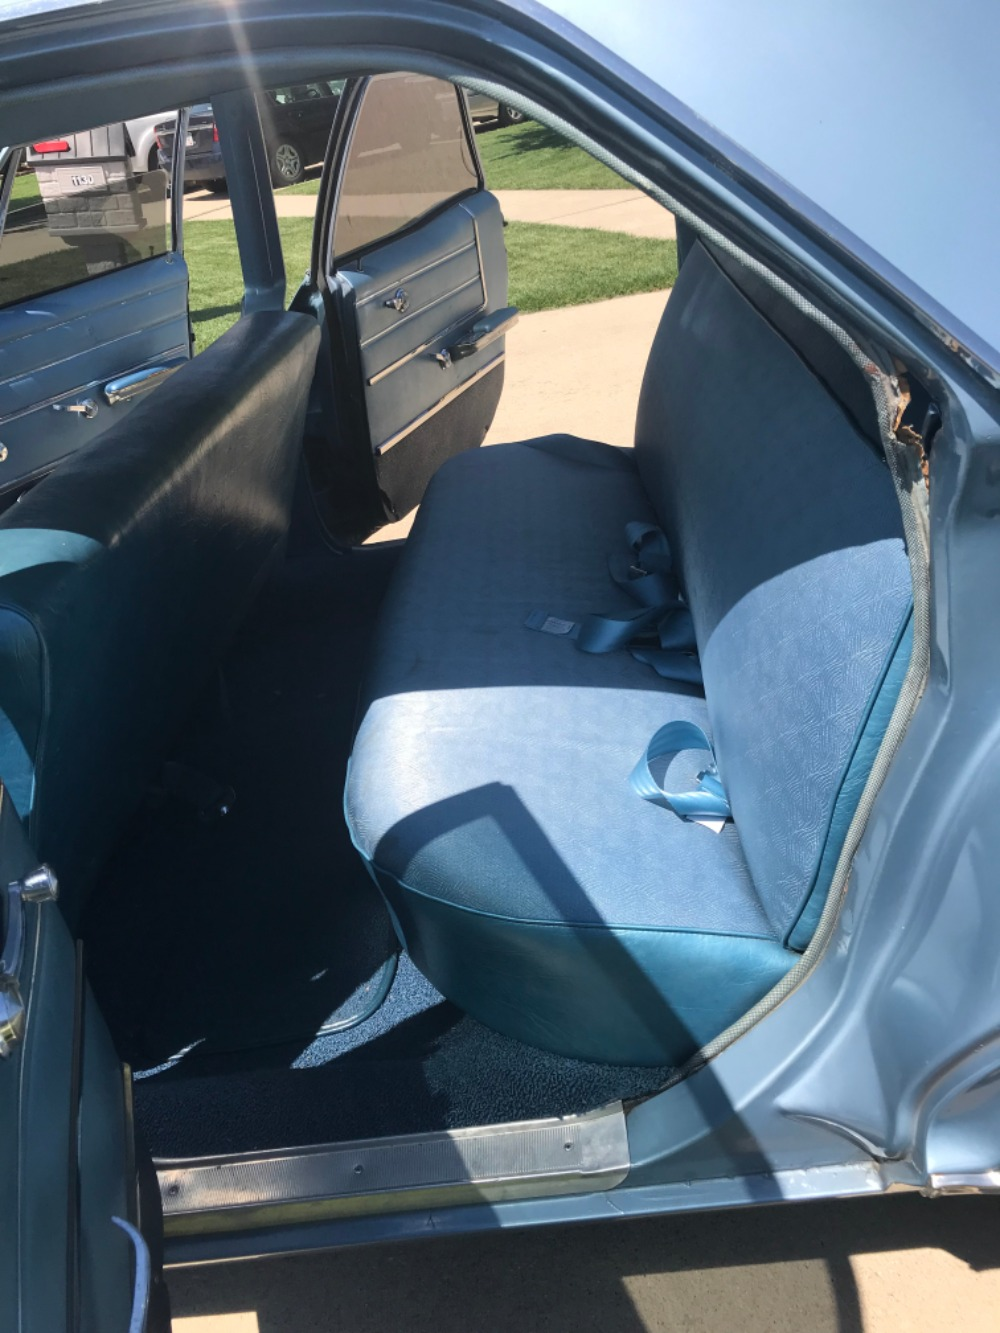 Used 1965 Buick Wildcat -BIG BLOCK CHEVY -SUPER SLEEPER- Family Cruiser!! | Mundelein, IL